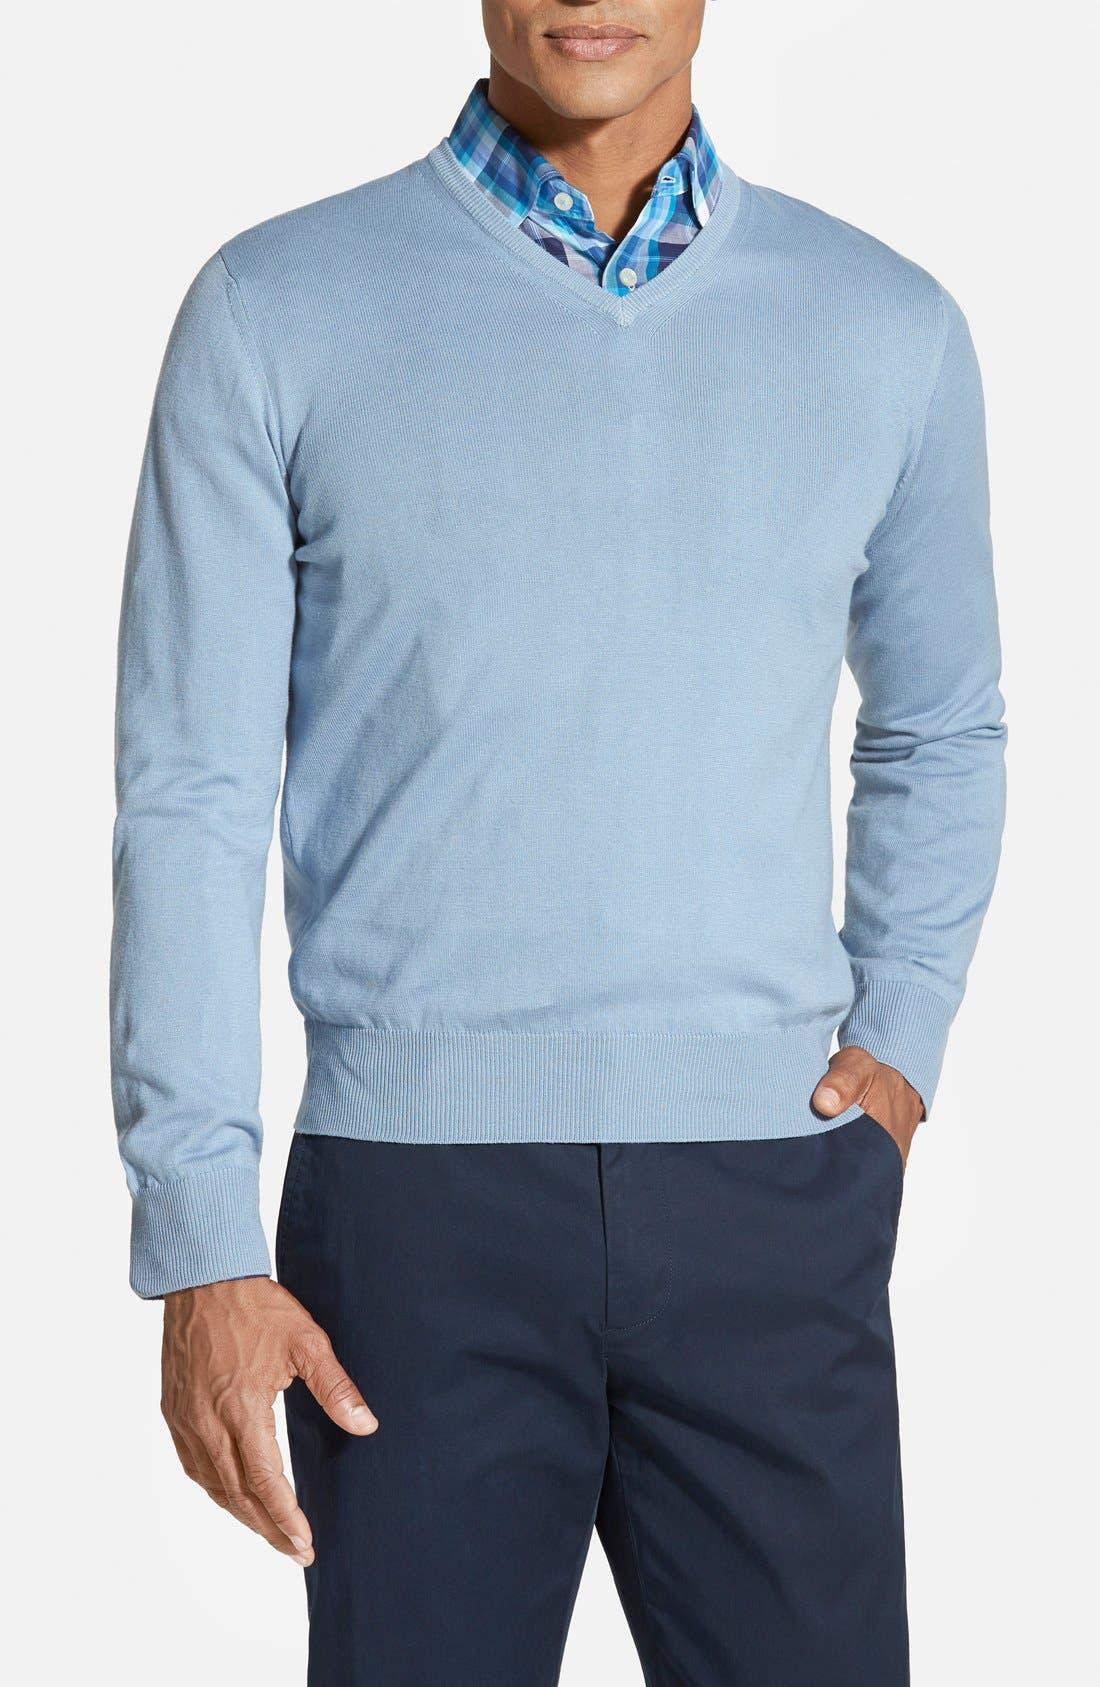 ROBERT TALBOTT Classic Fit V-Neck Sweater